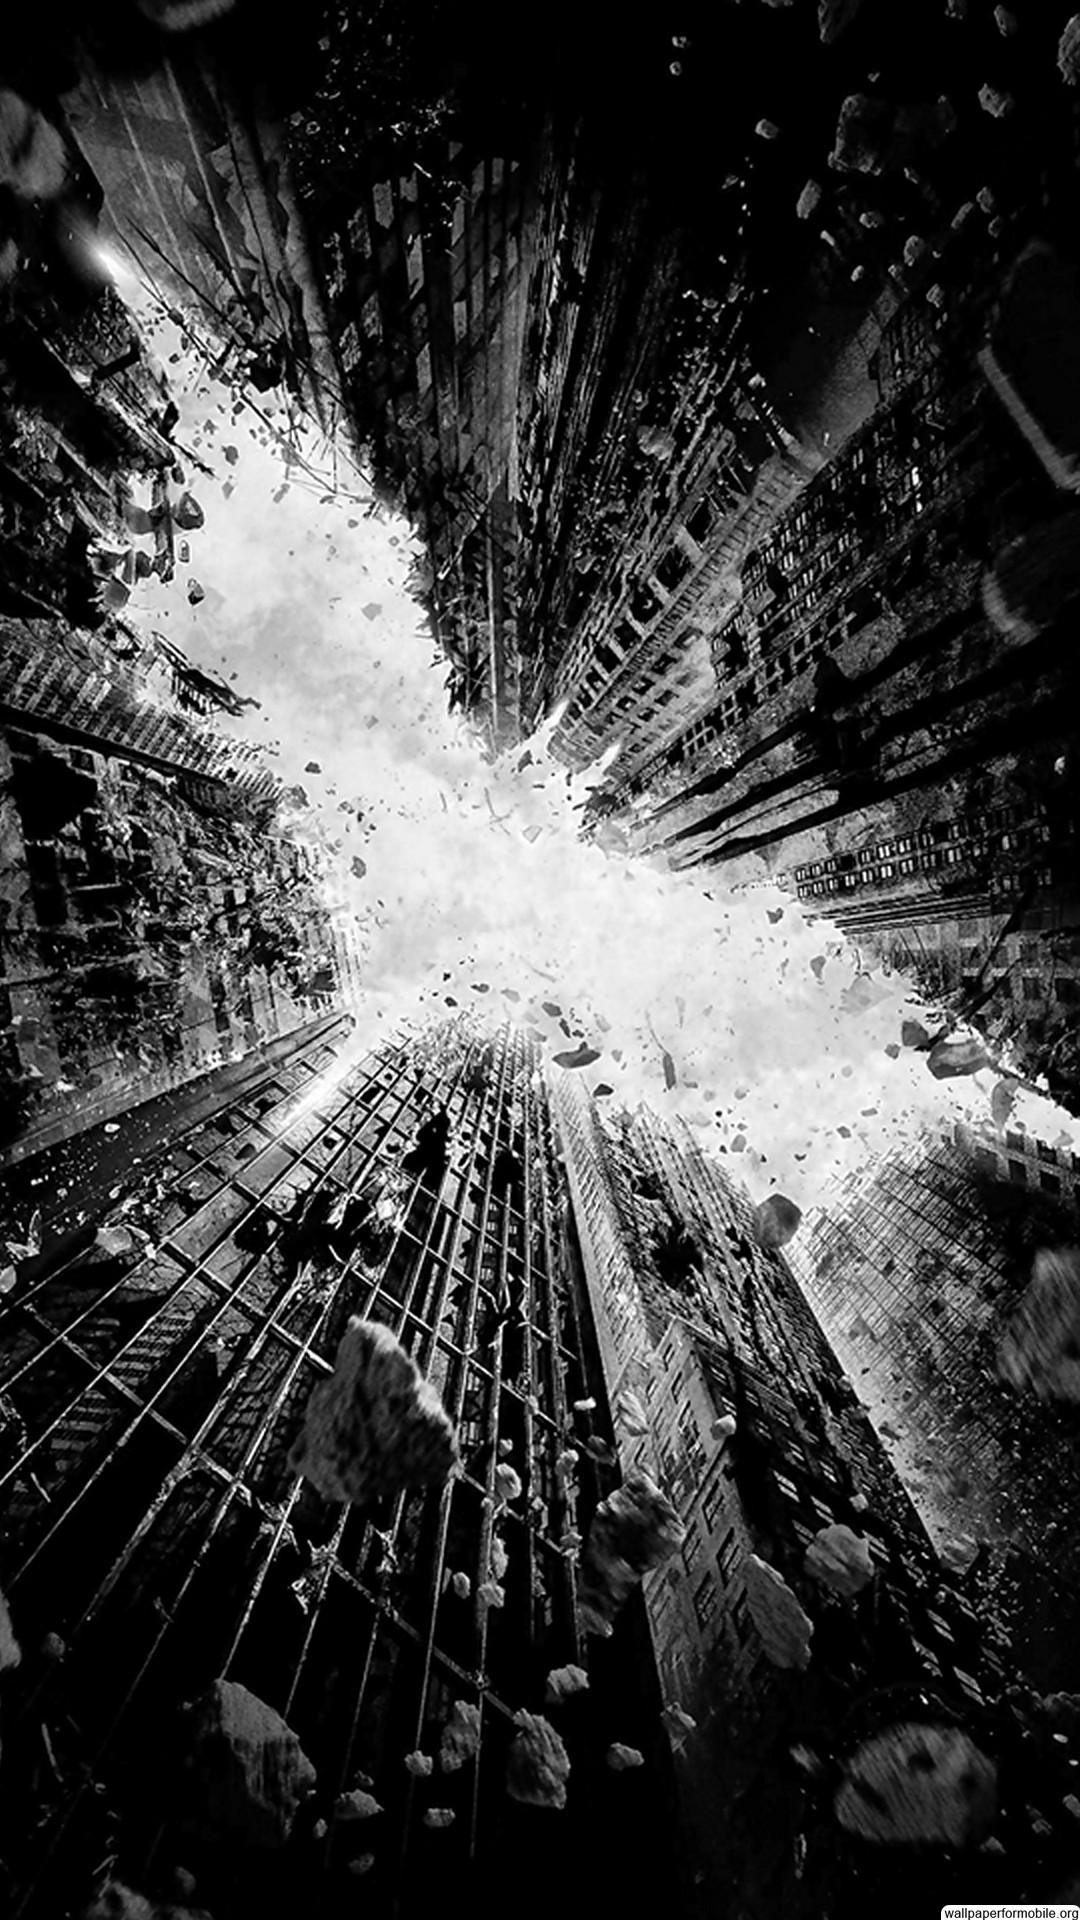 The Dark Knight Wallpaper (83+ images) |Dark Knight Rises Iphone Wallpaper